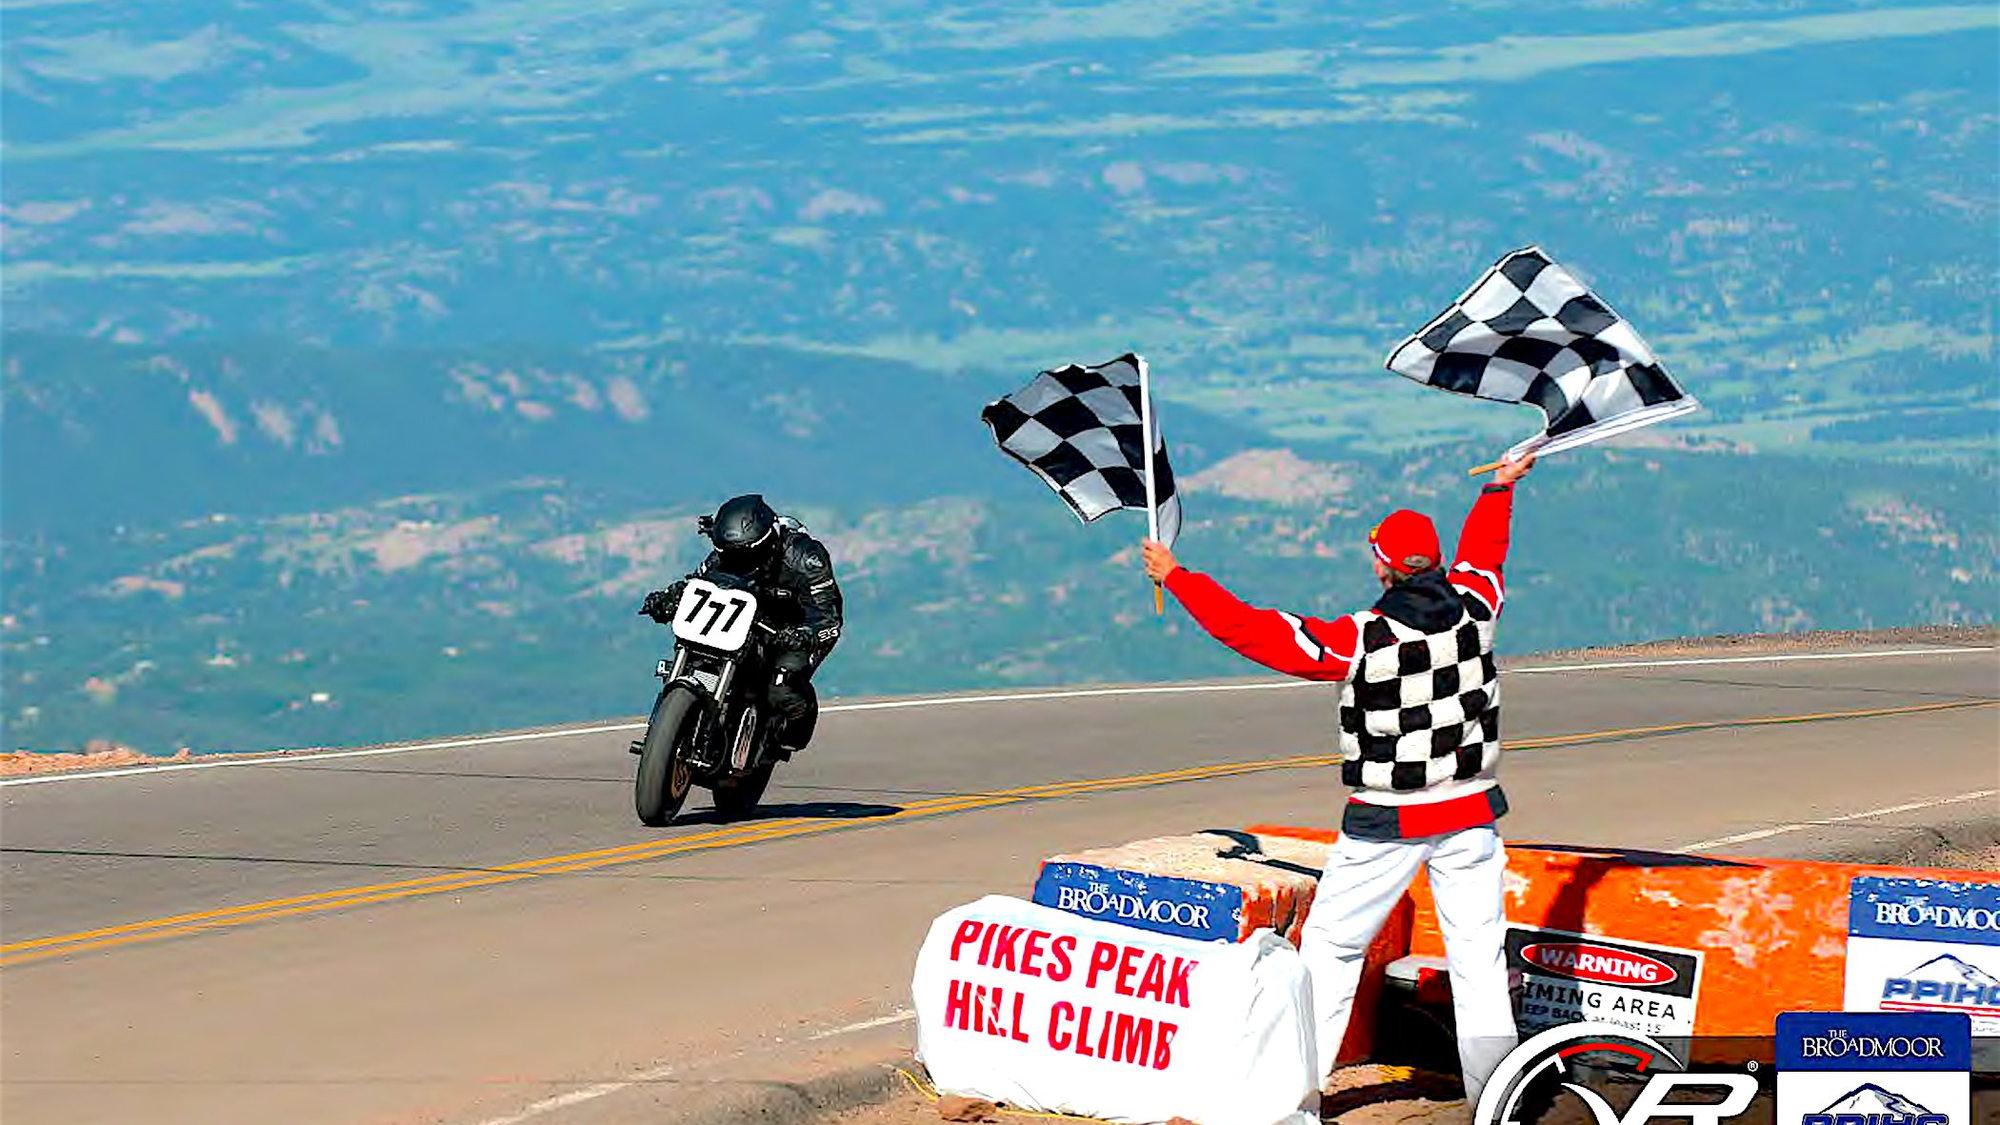 Hollywood Electrics Racing motorcycle, 2014 class winner at Pikes Peak